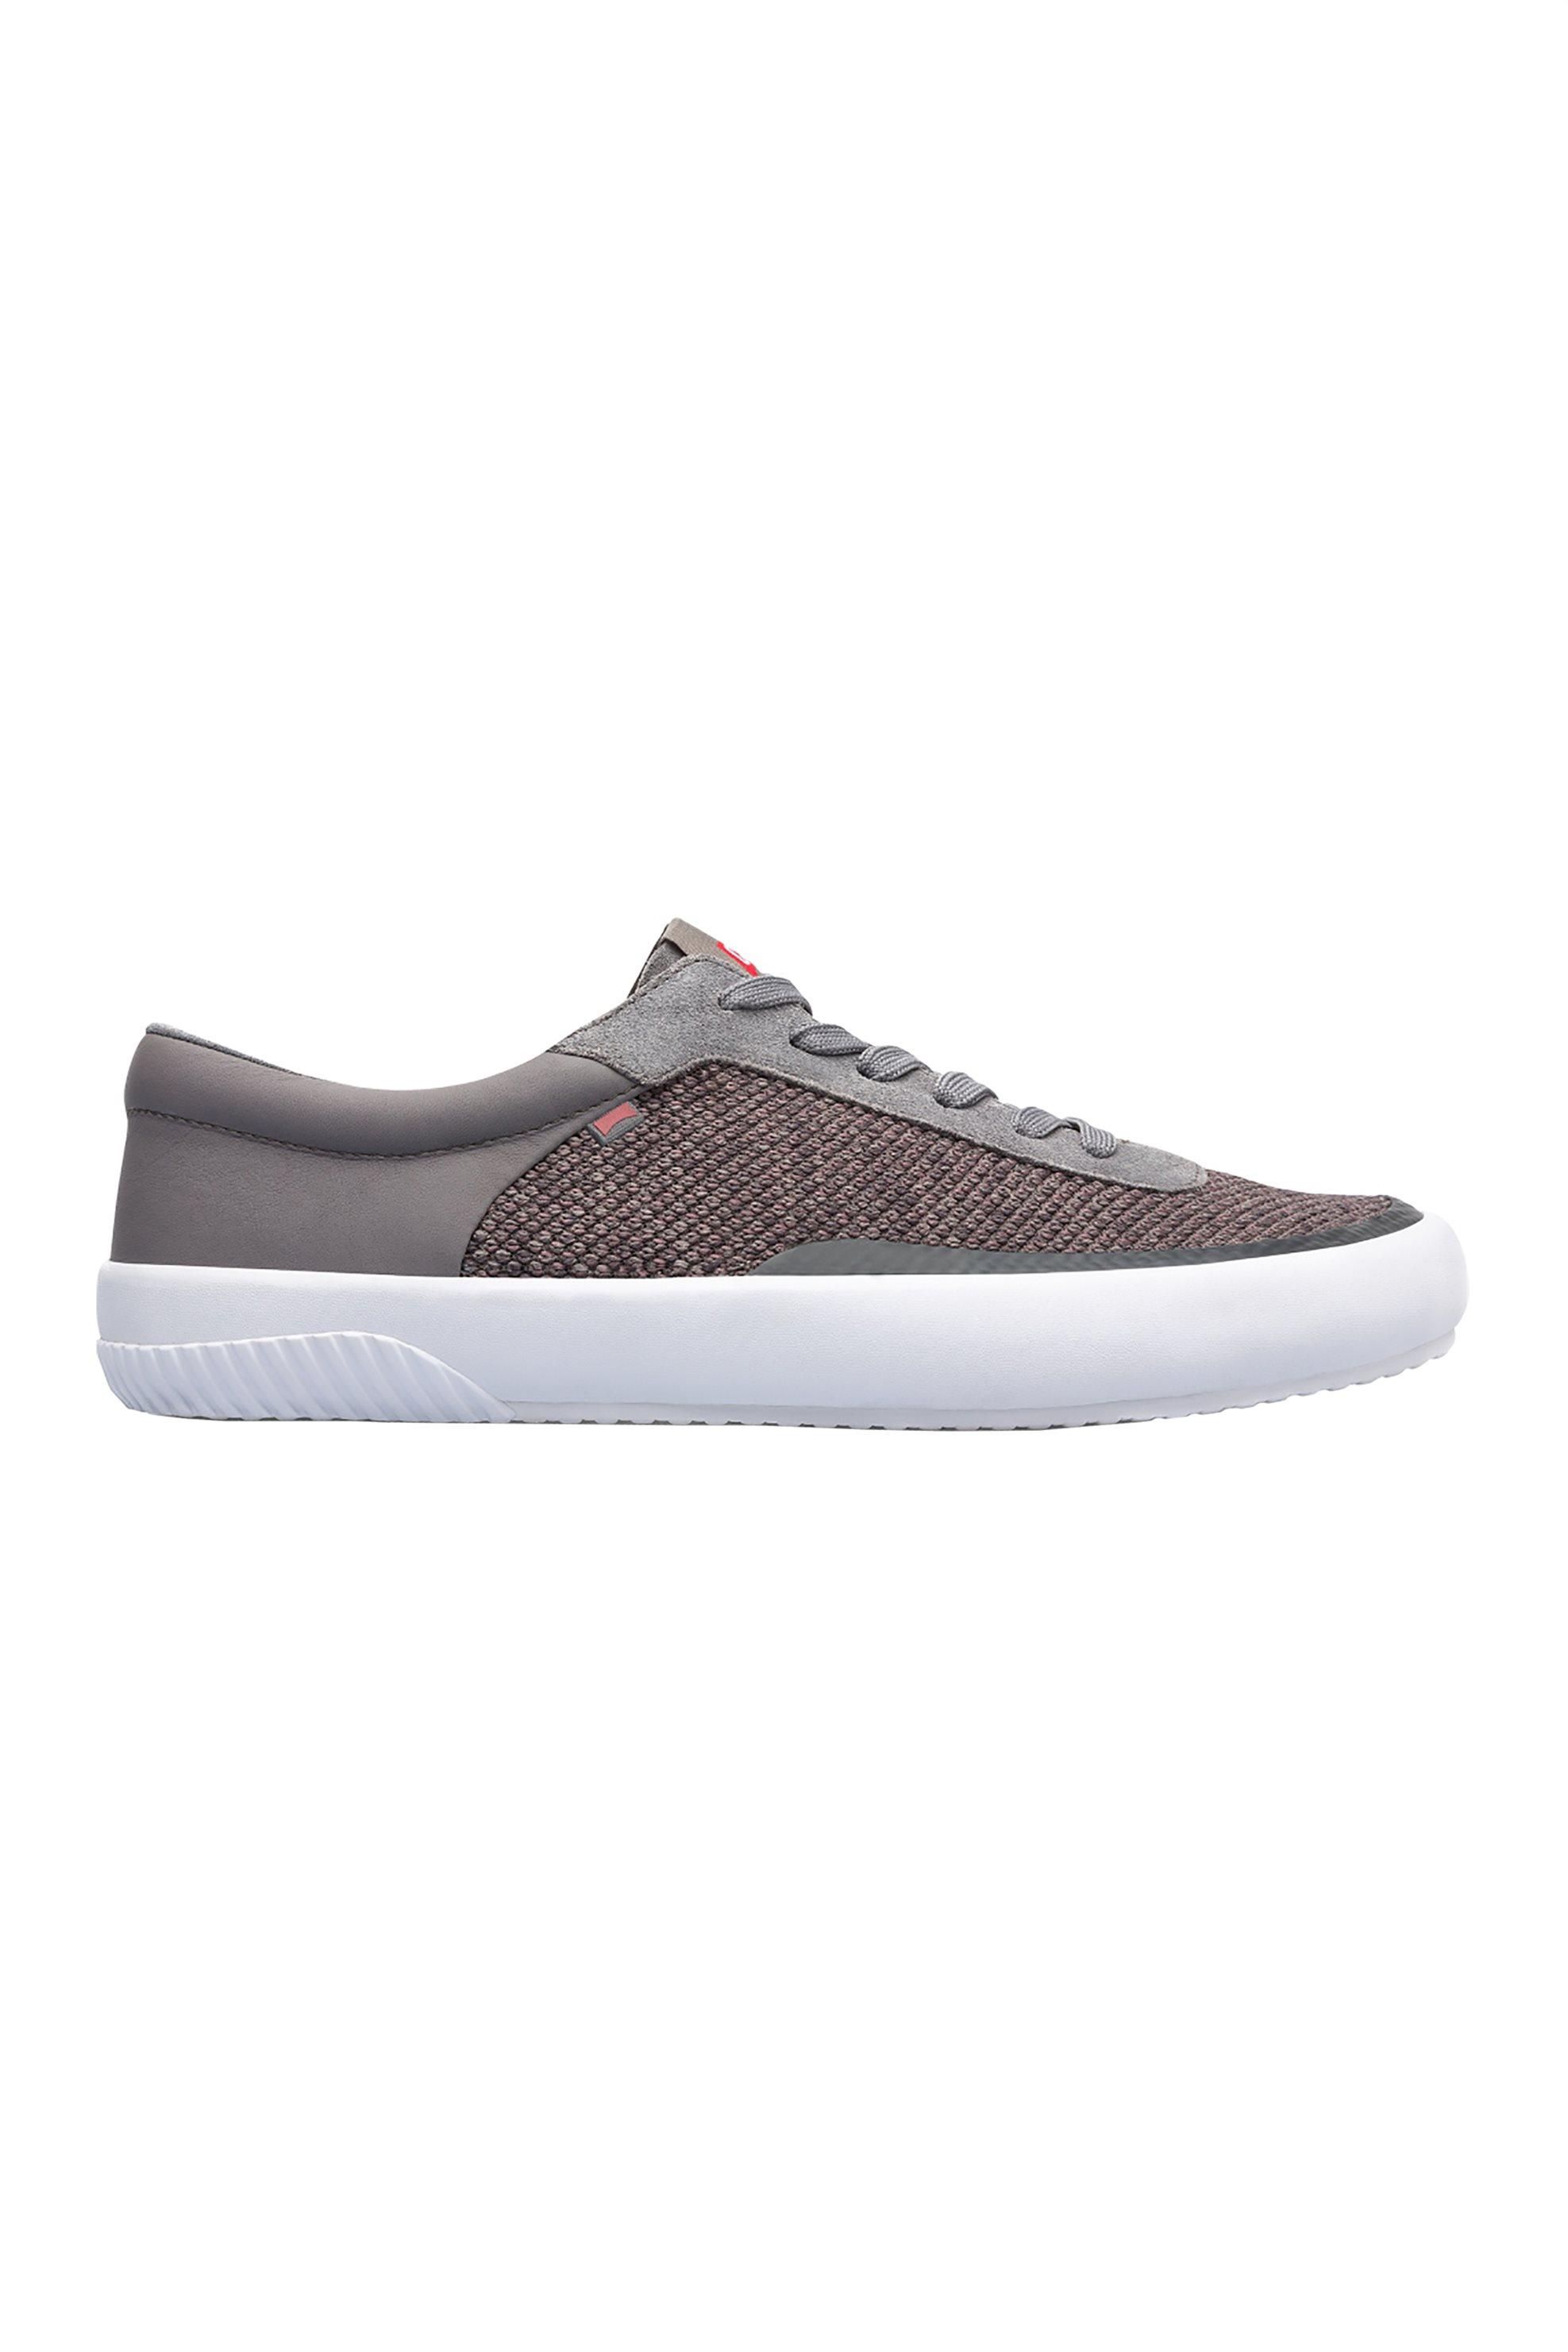 66629a3f8c8 Notos Camper ανδρικά υφασμάτινα παπούτσια Peu Rambla – K100413-005 – Γκρι